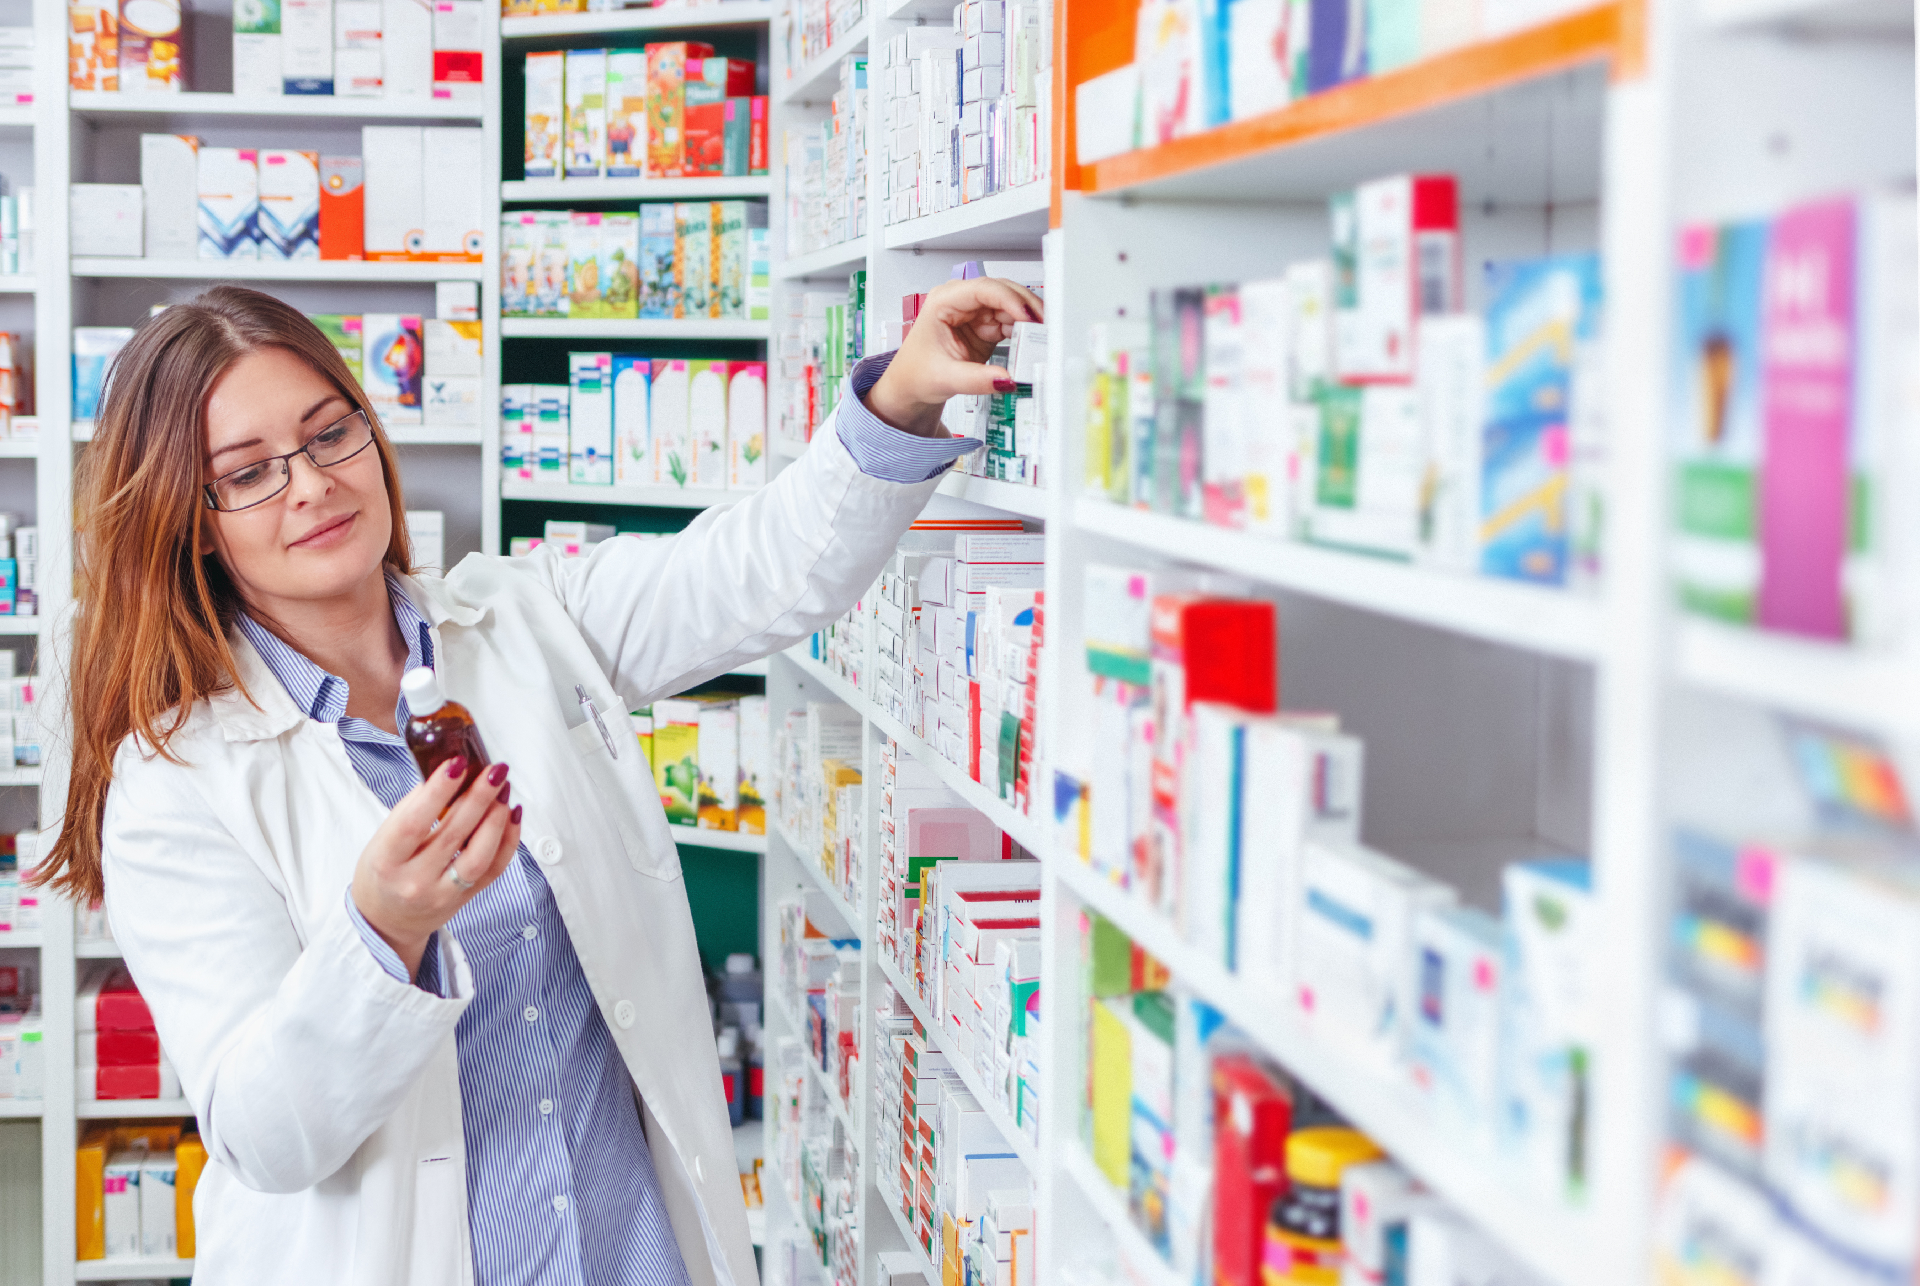 Woman holding a bottle in a pharmacy